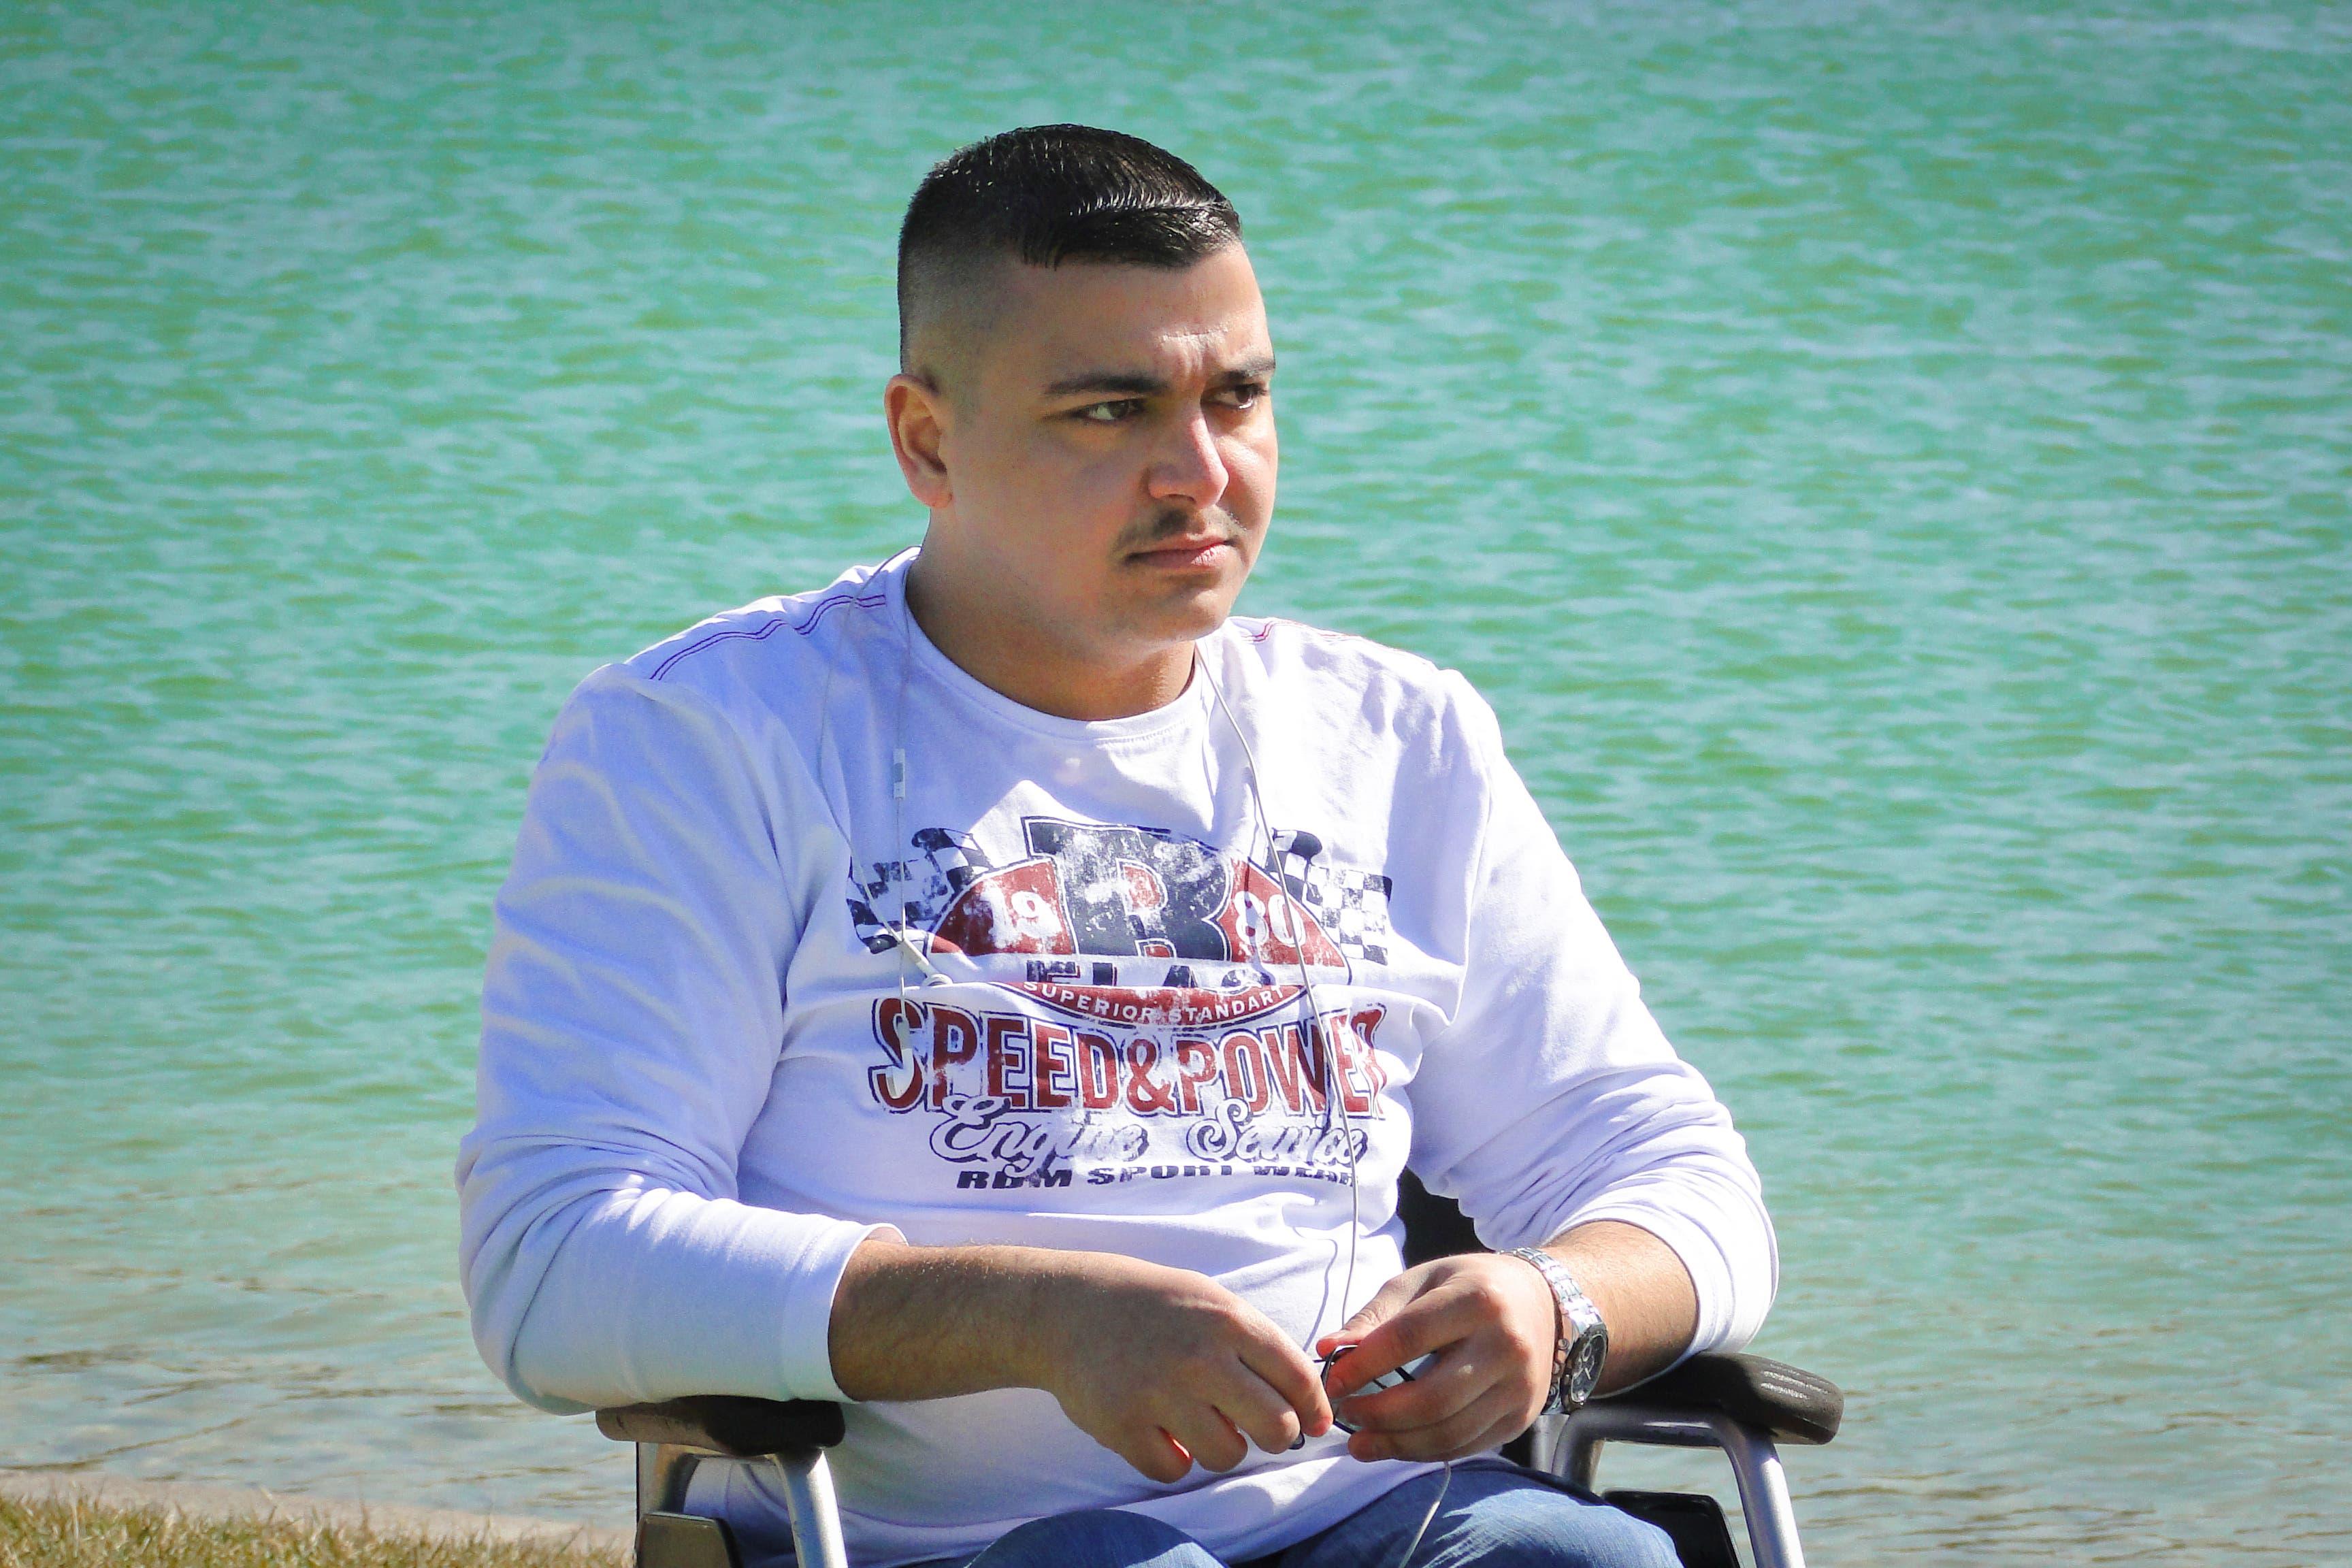 Iraq Shounaz Mekky handicapped Abdaly